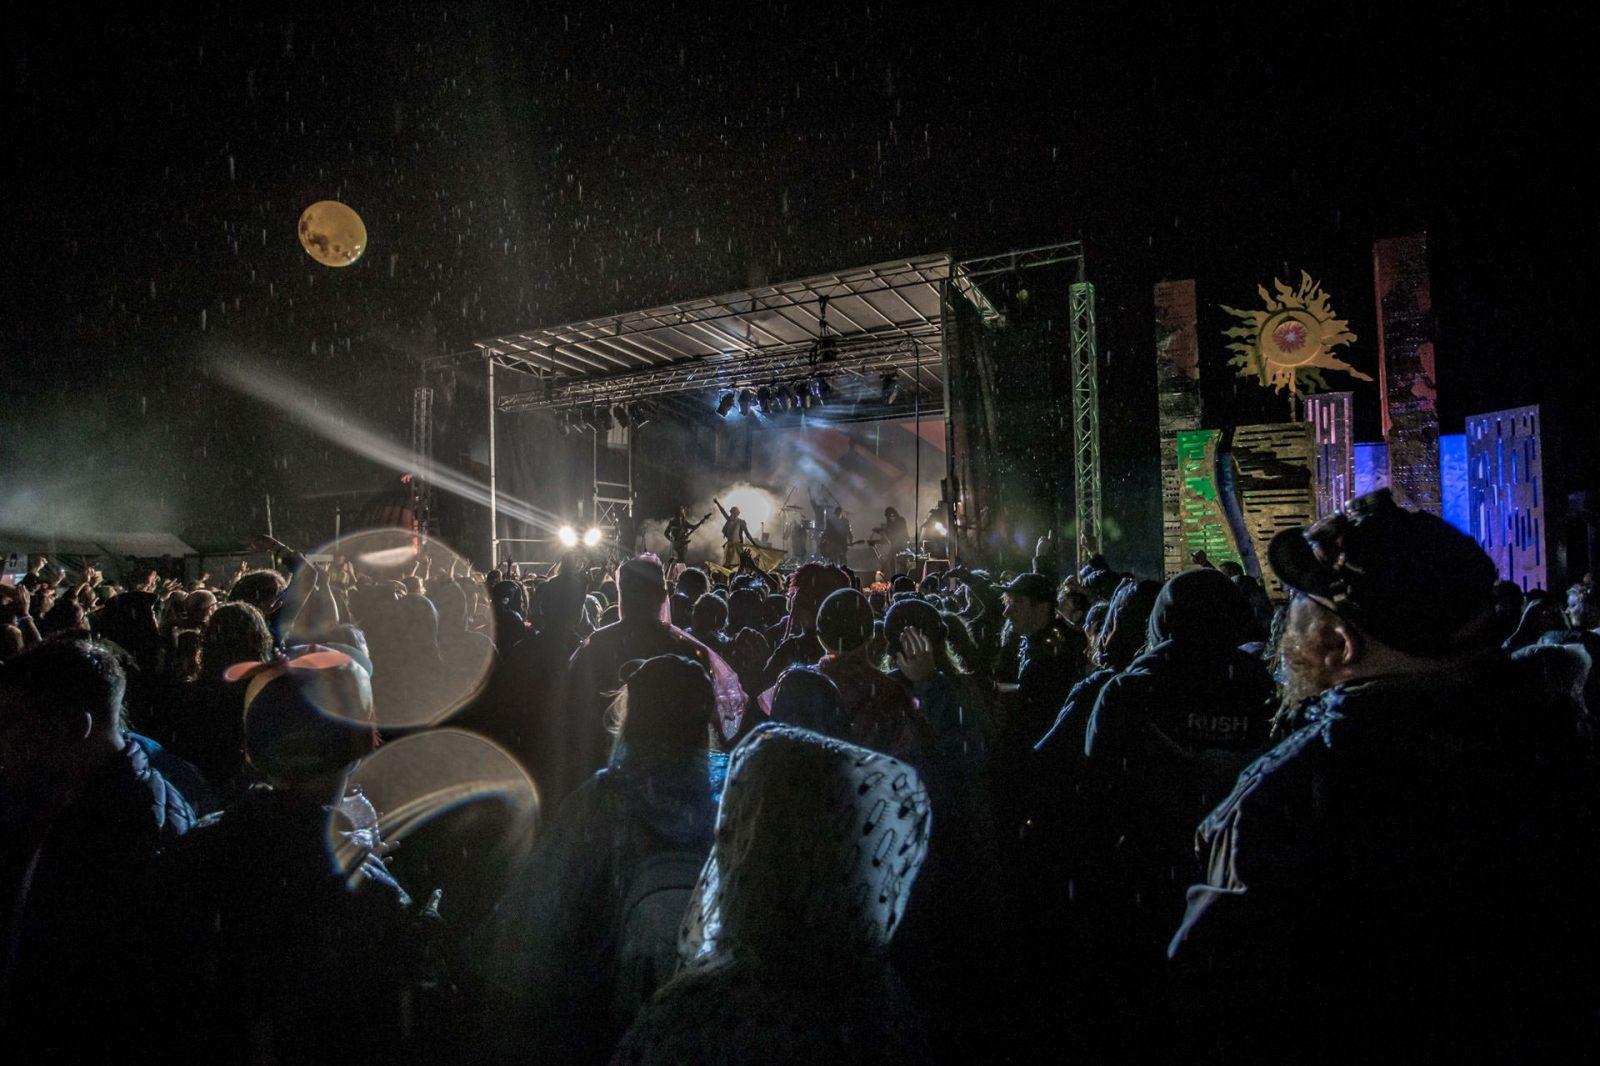 King Kong Company, Sunflowerfest 2017, Sunflowerfest 2018, Tubby's Farm, Hillsborough, CMcGuigan Photography, Chris McGuigan Photography, Festival